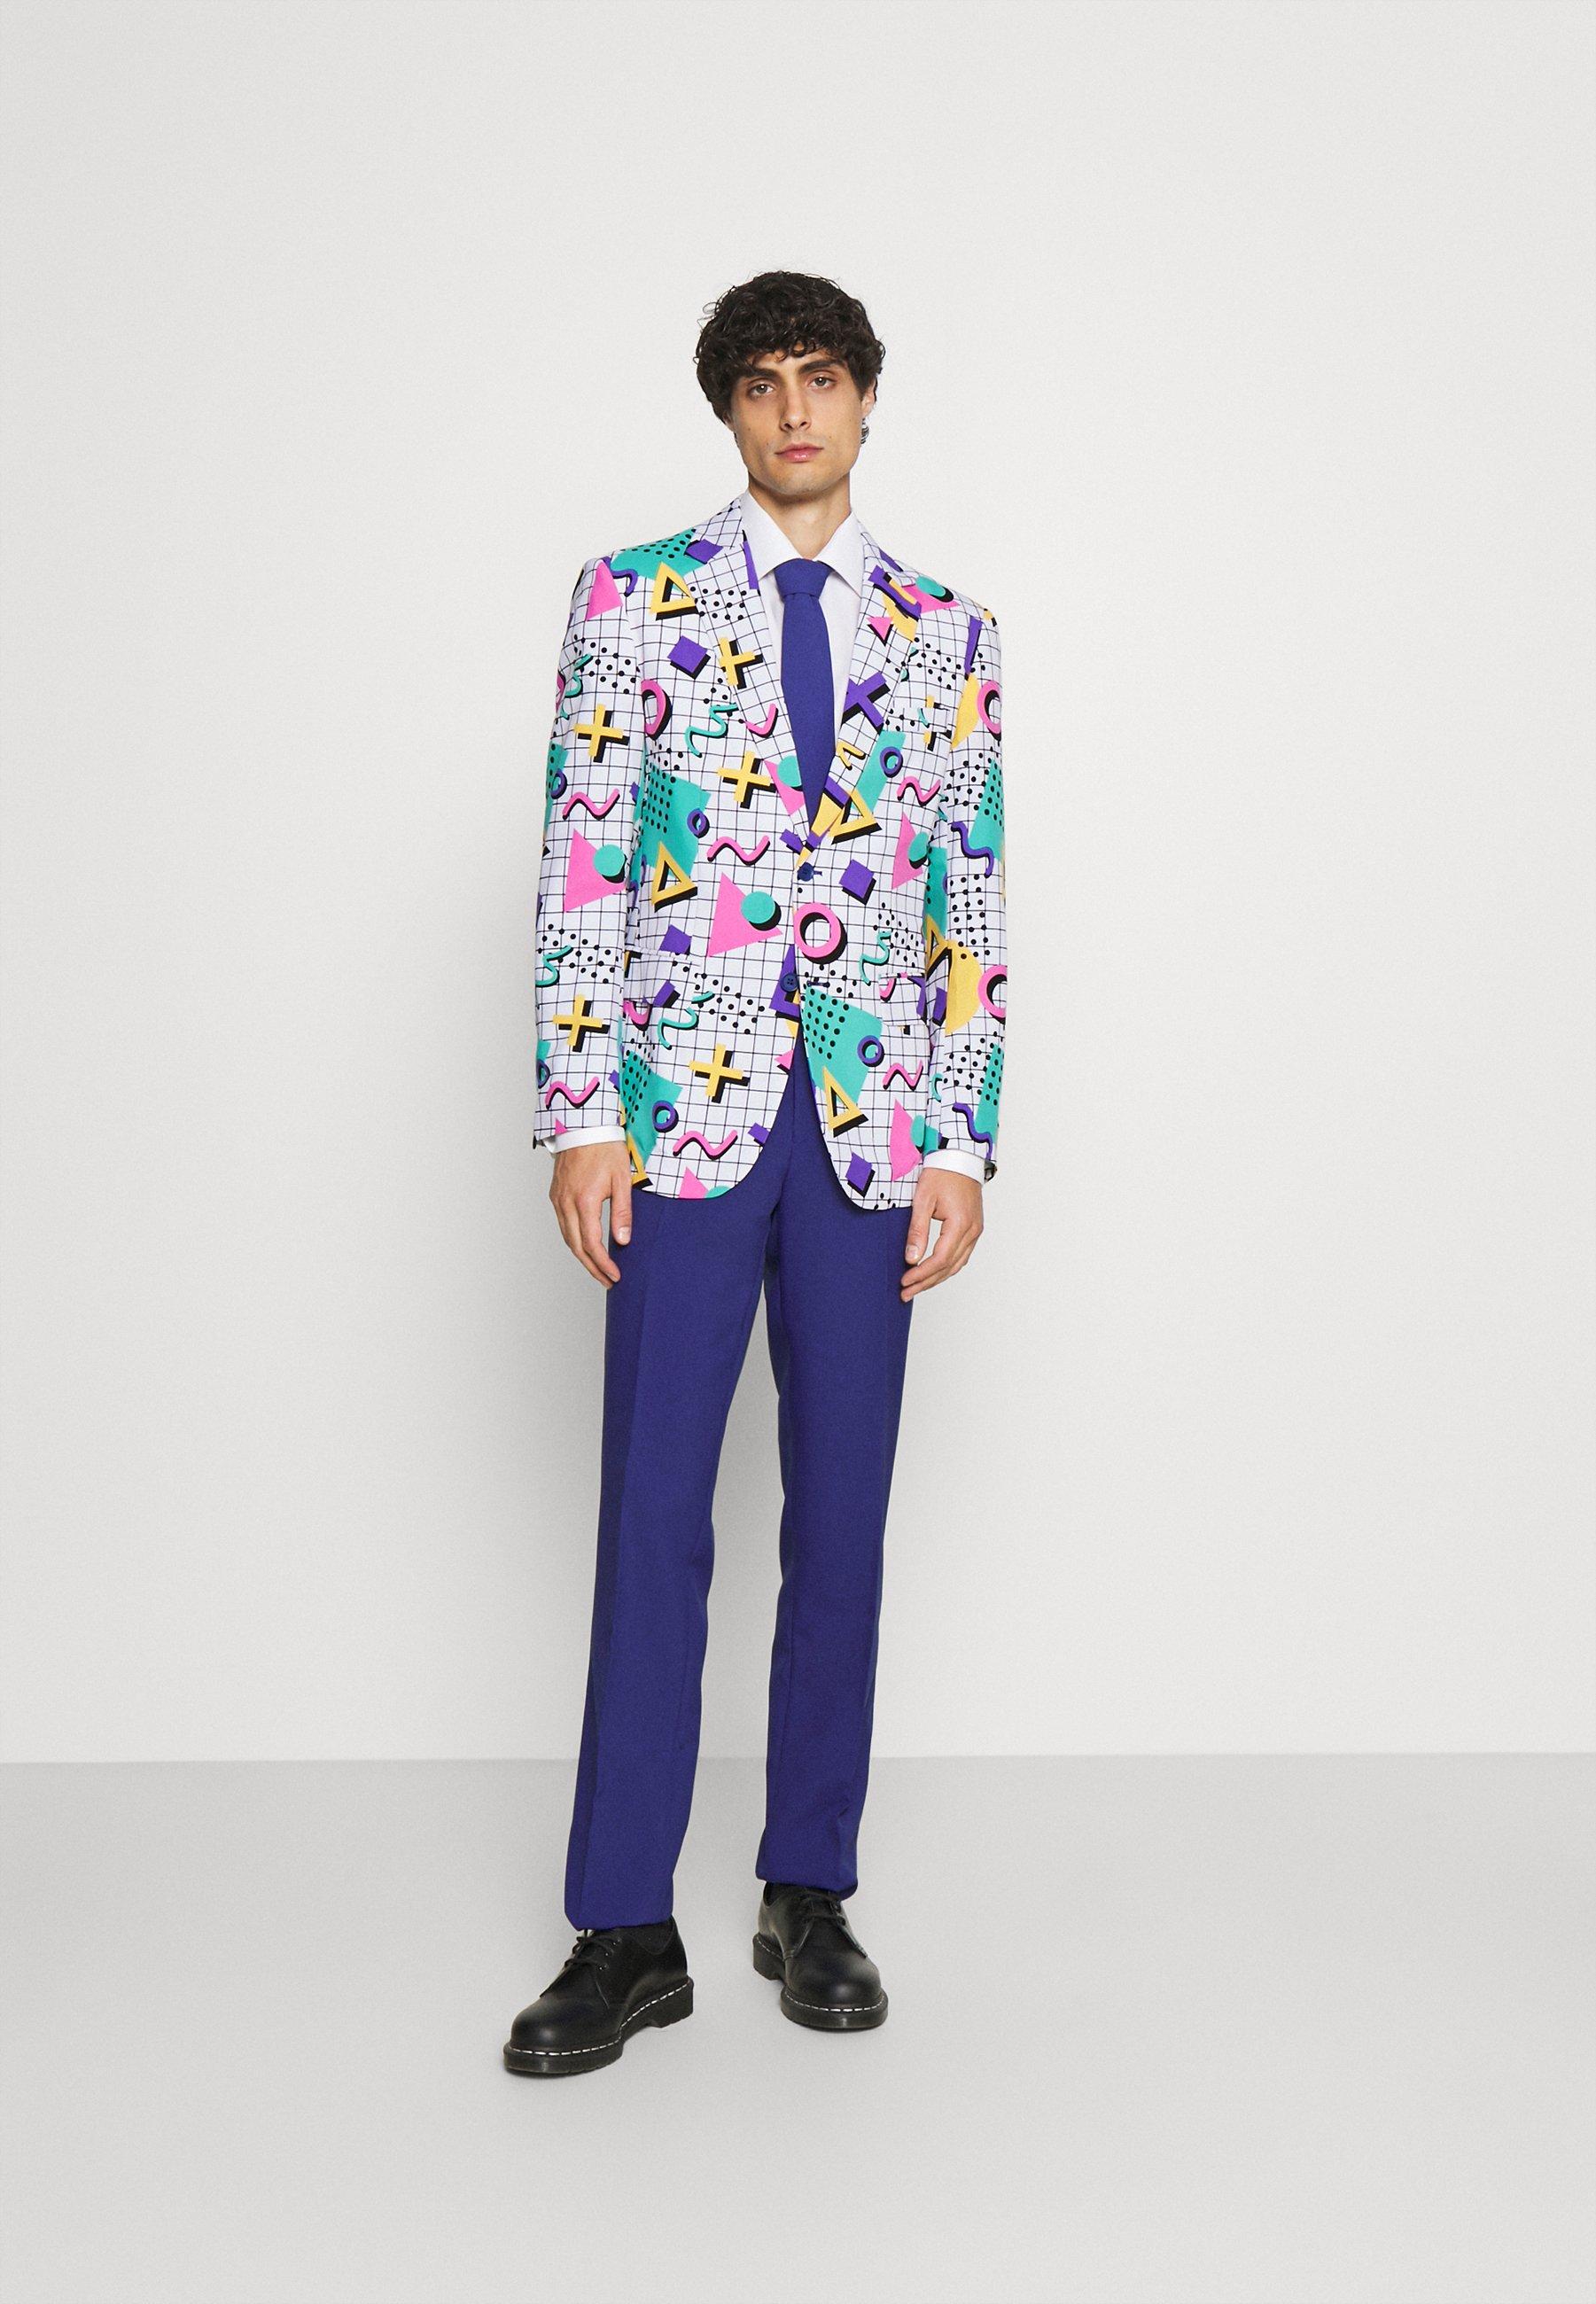 Homme MEMPHIS MASTER SET - Costume